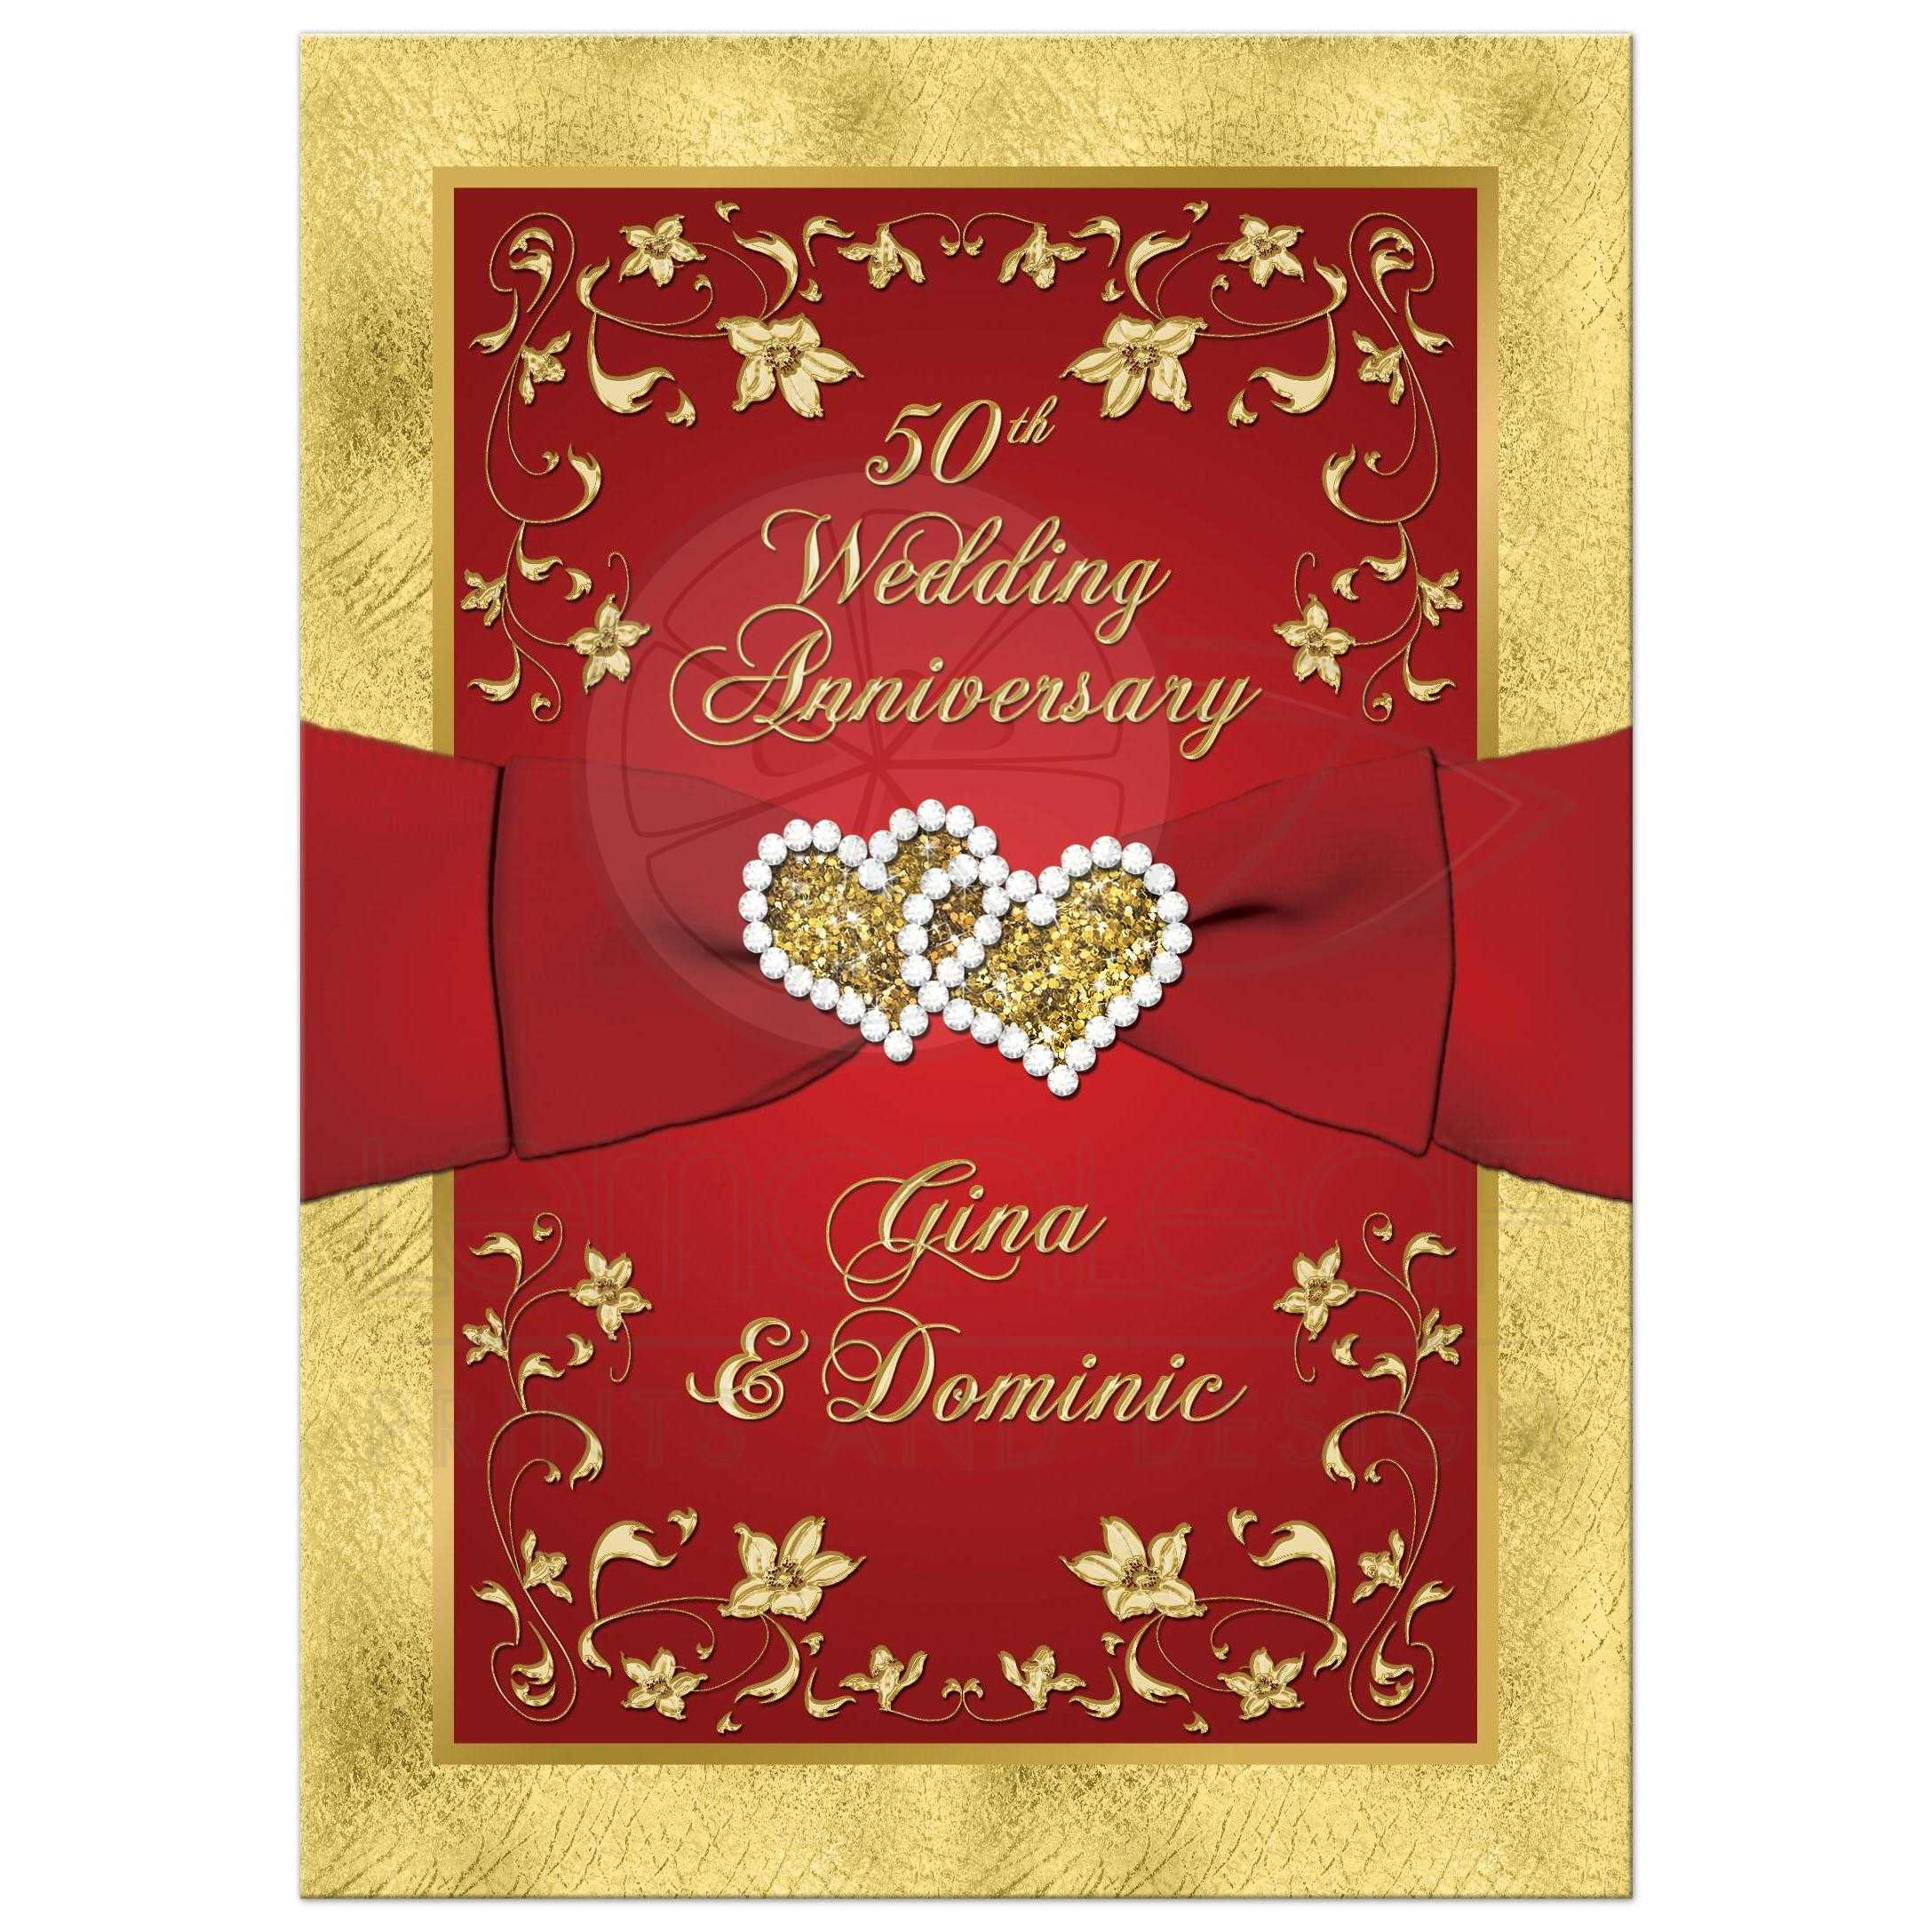 Cheap 50th wedding anniversary invitations